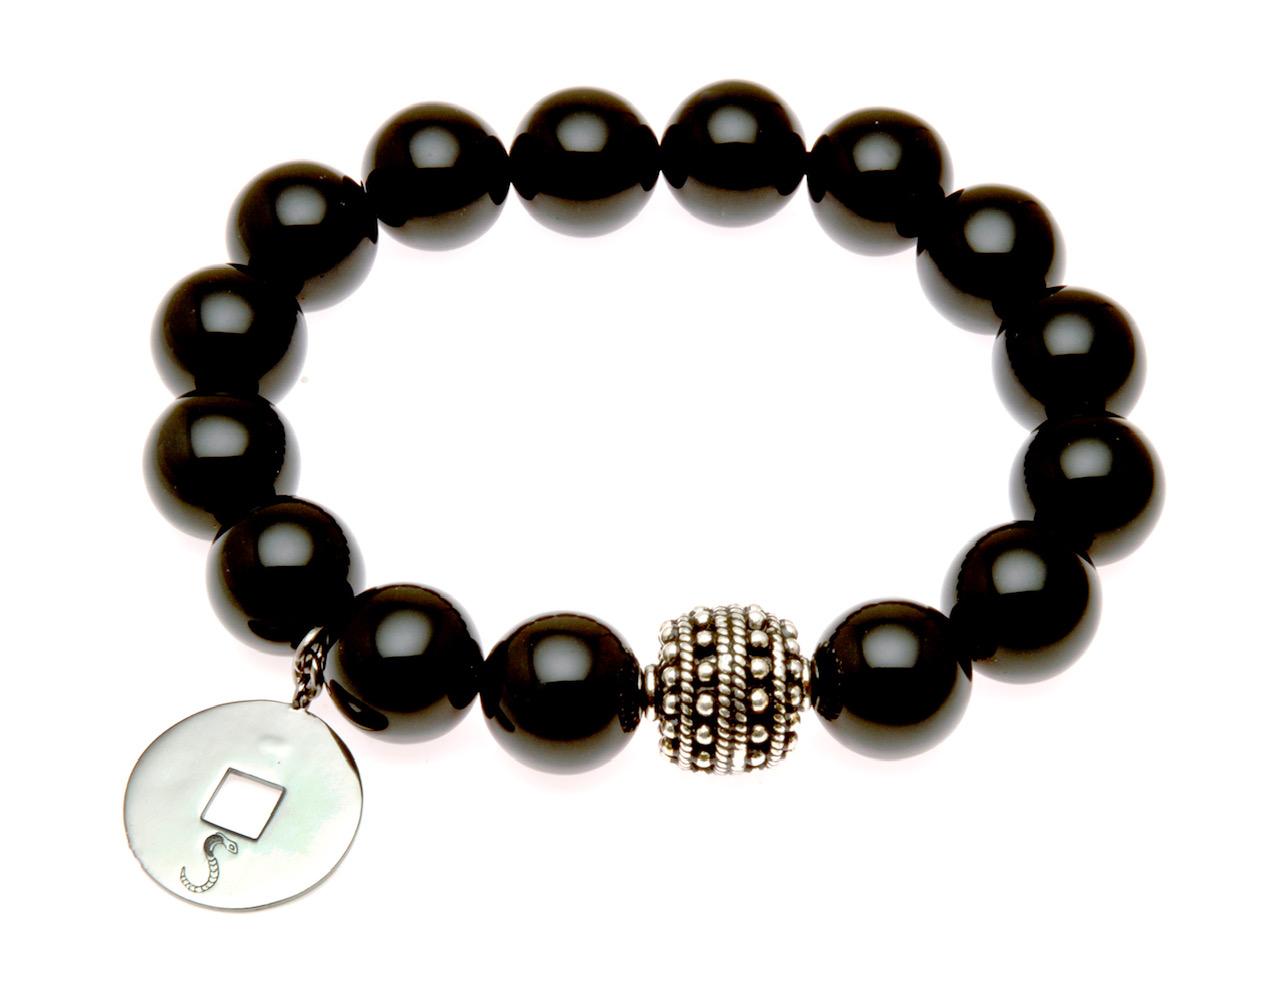 Metal_bracelet_6910_4x5.jpg